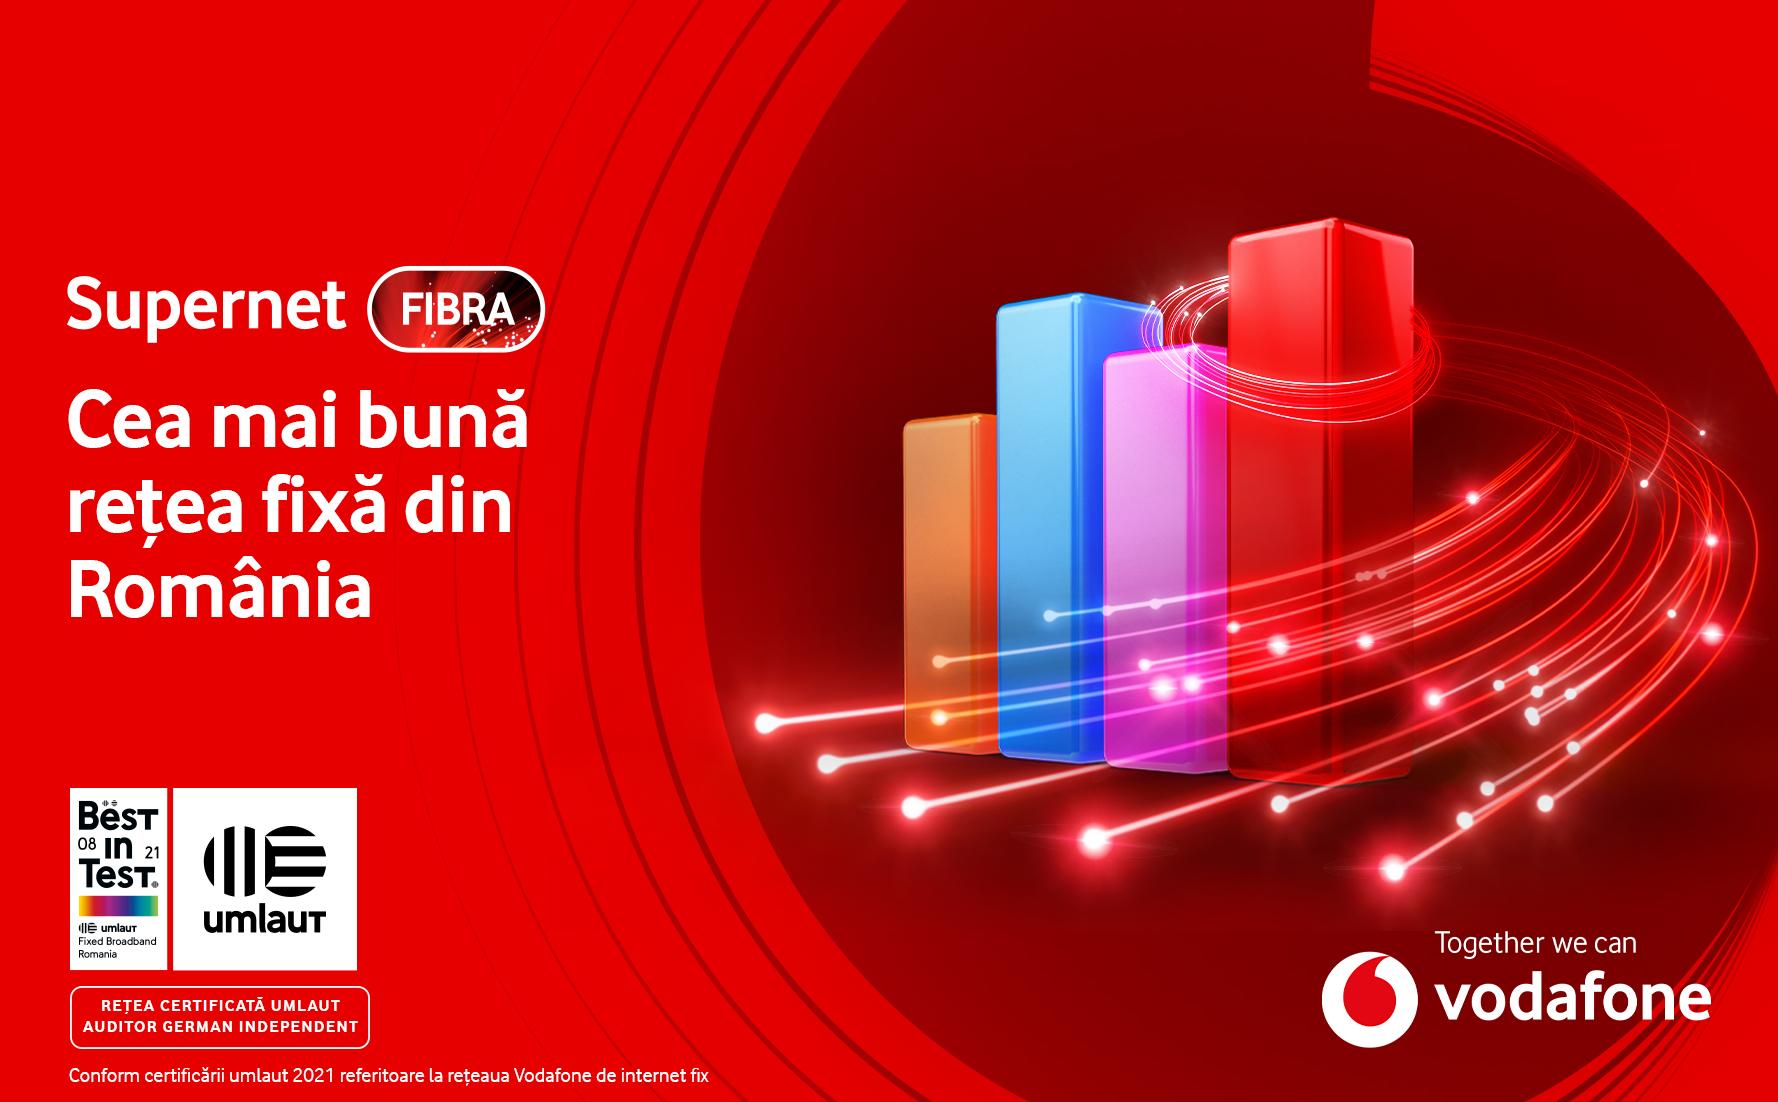 1 Vodafone Supernet Fibra_certificare umlaut (2)